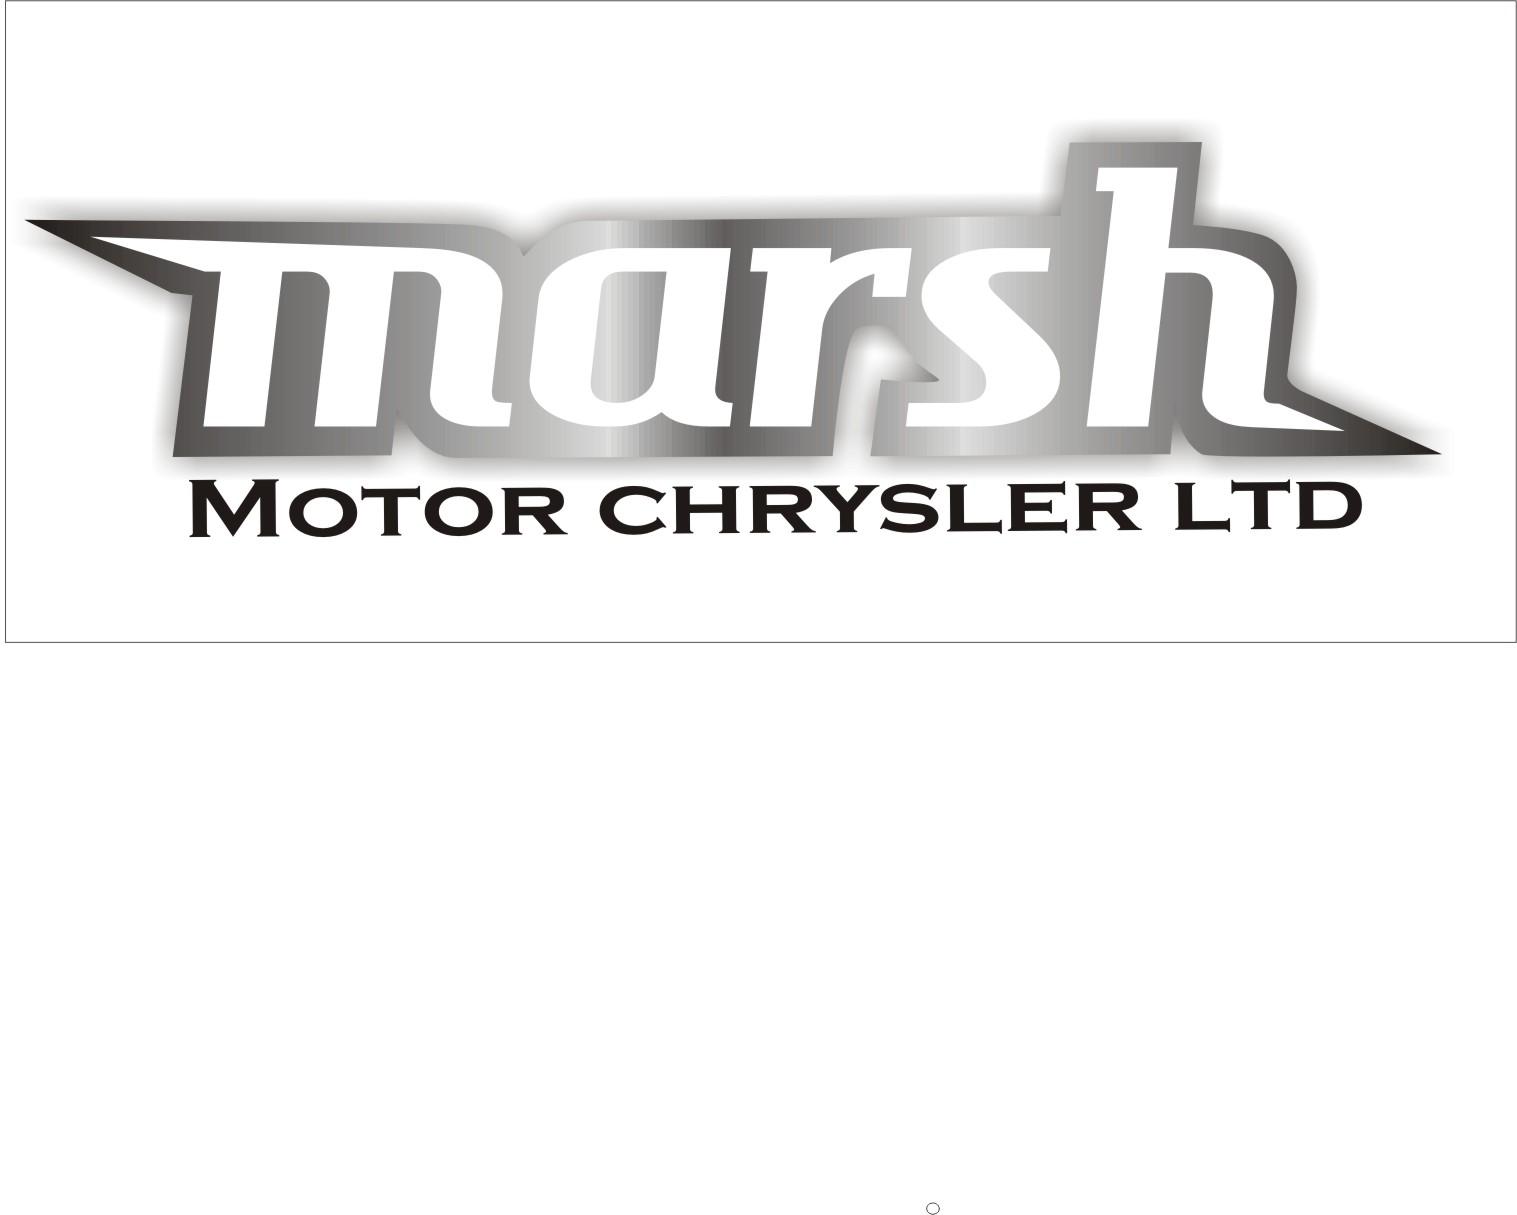 Logo Design by Aveeb Murdavein - Entry No. 9 in the Logo Design Contest Marsh Motors Chrysler Logo Design.